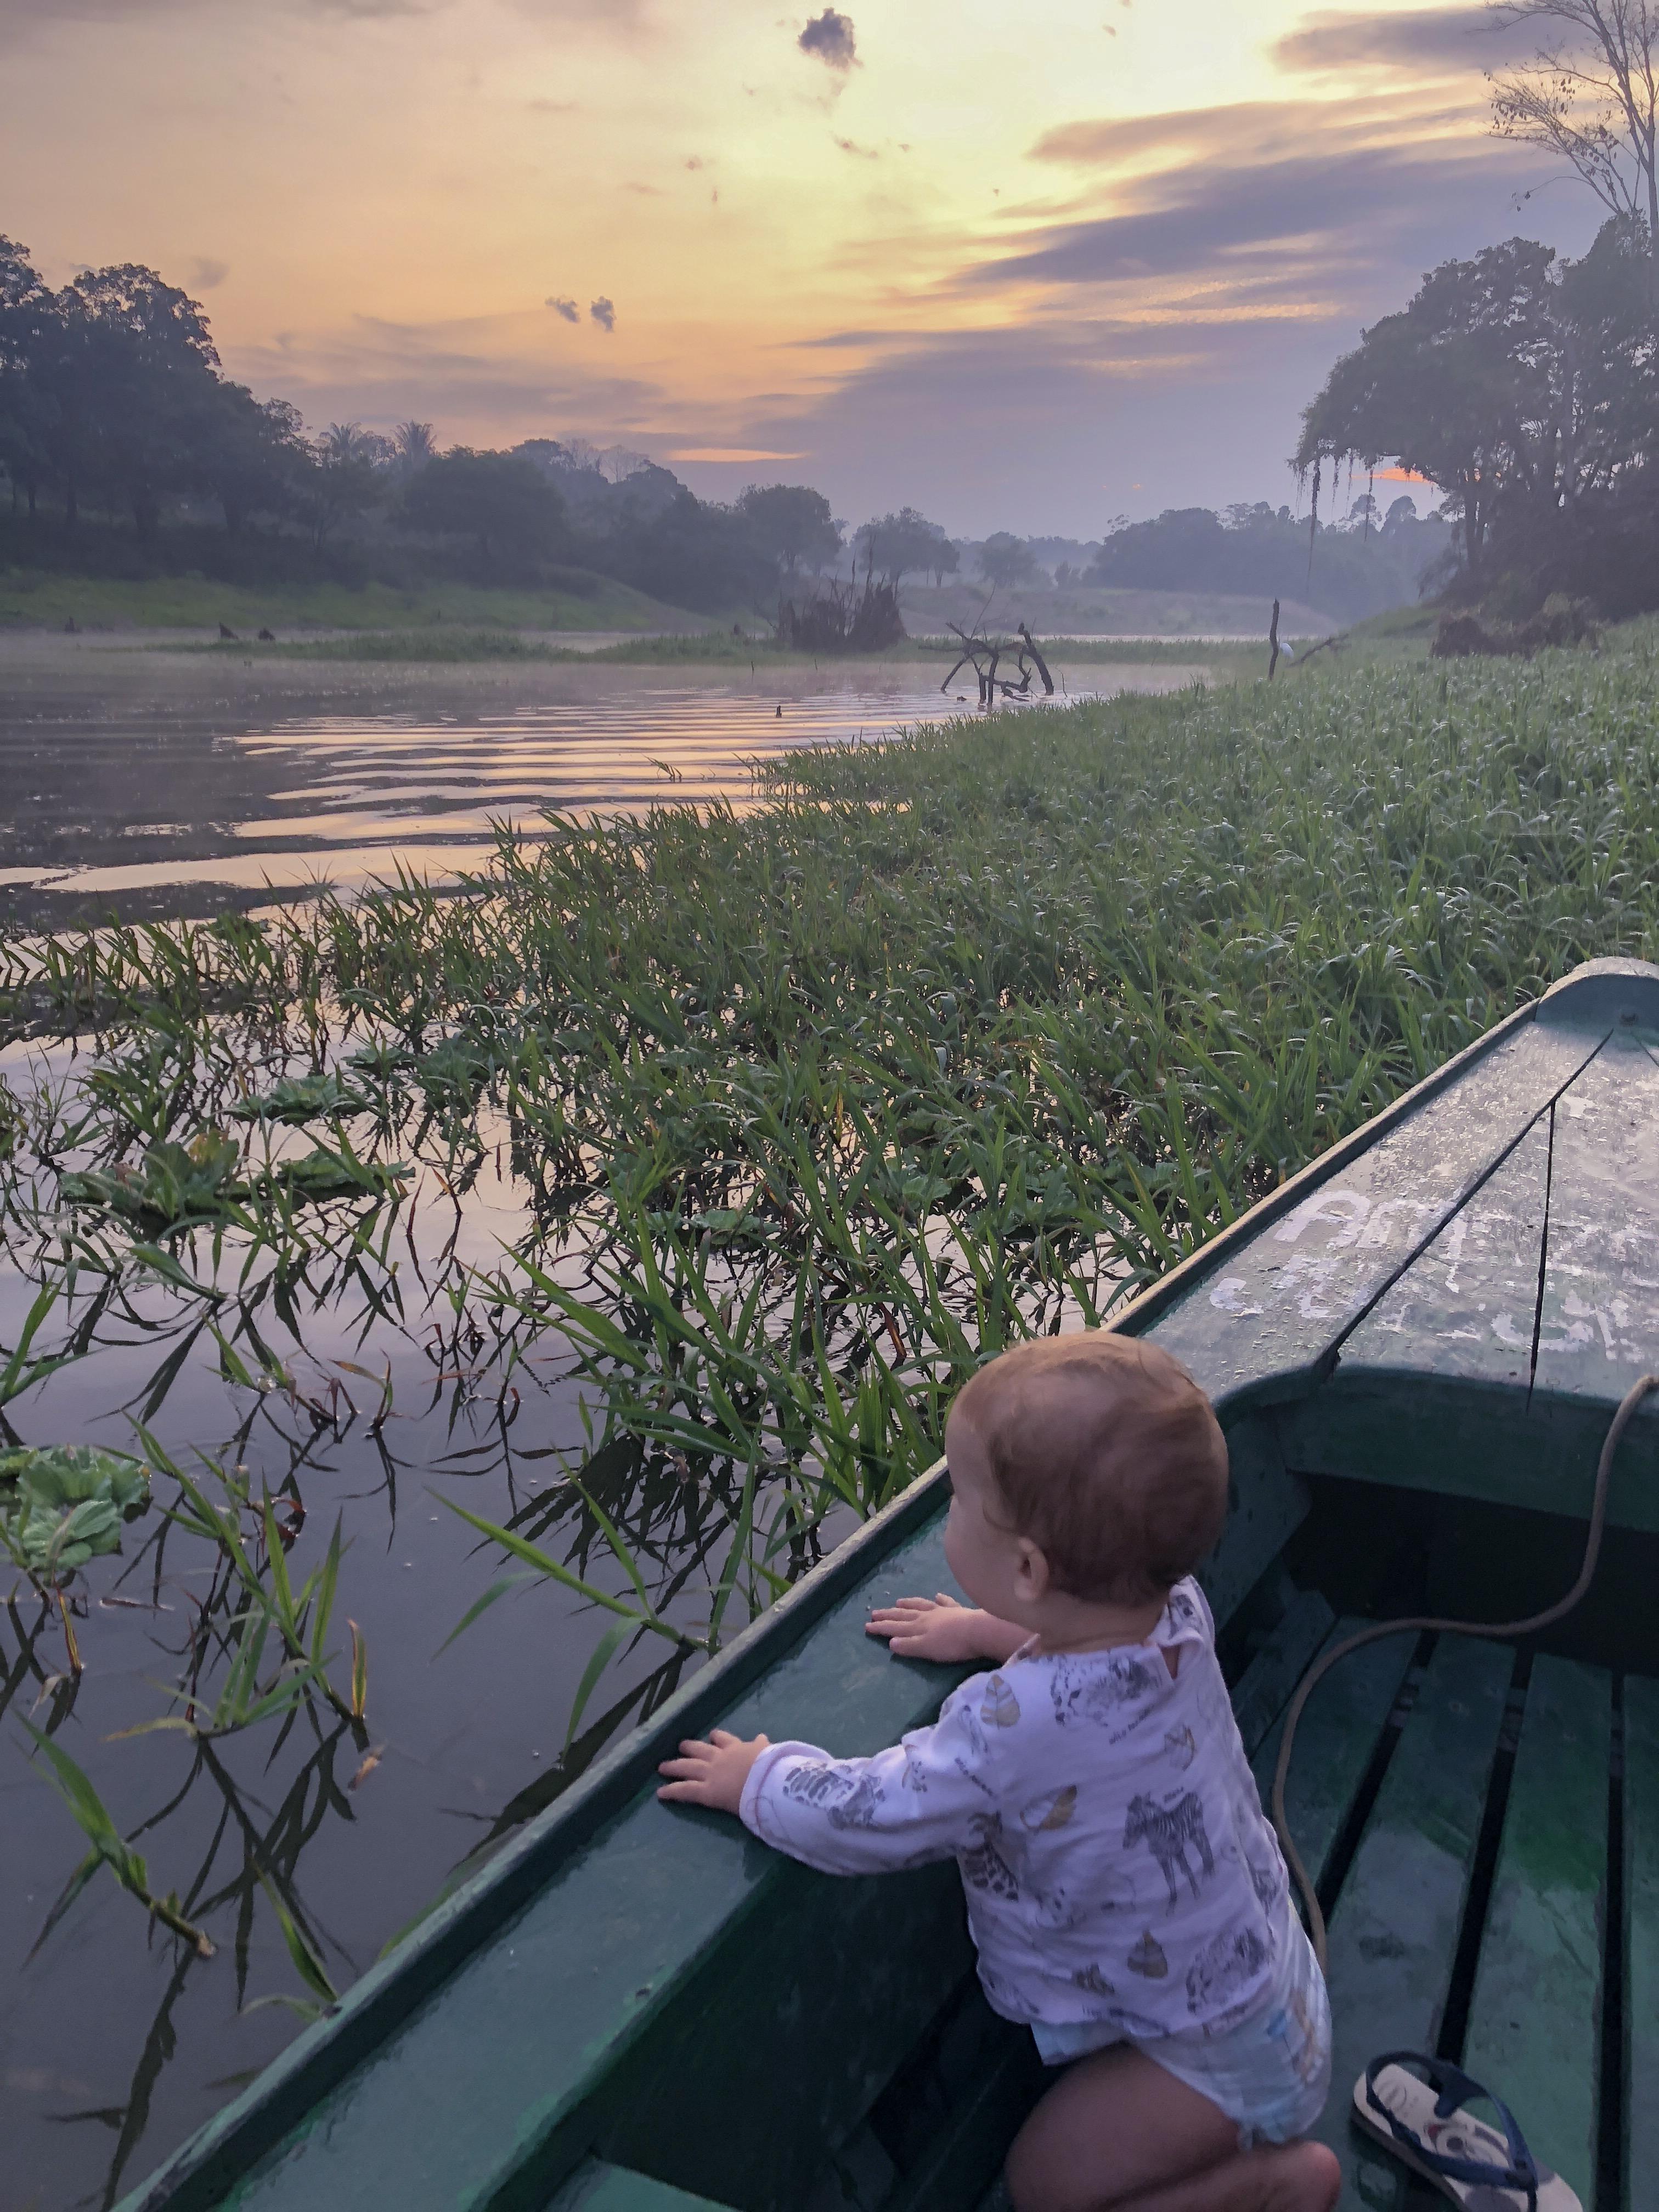 Amazonia , floresta amazónica , Amazonie , viajar com criança